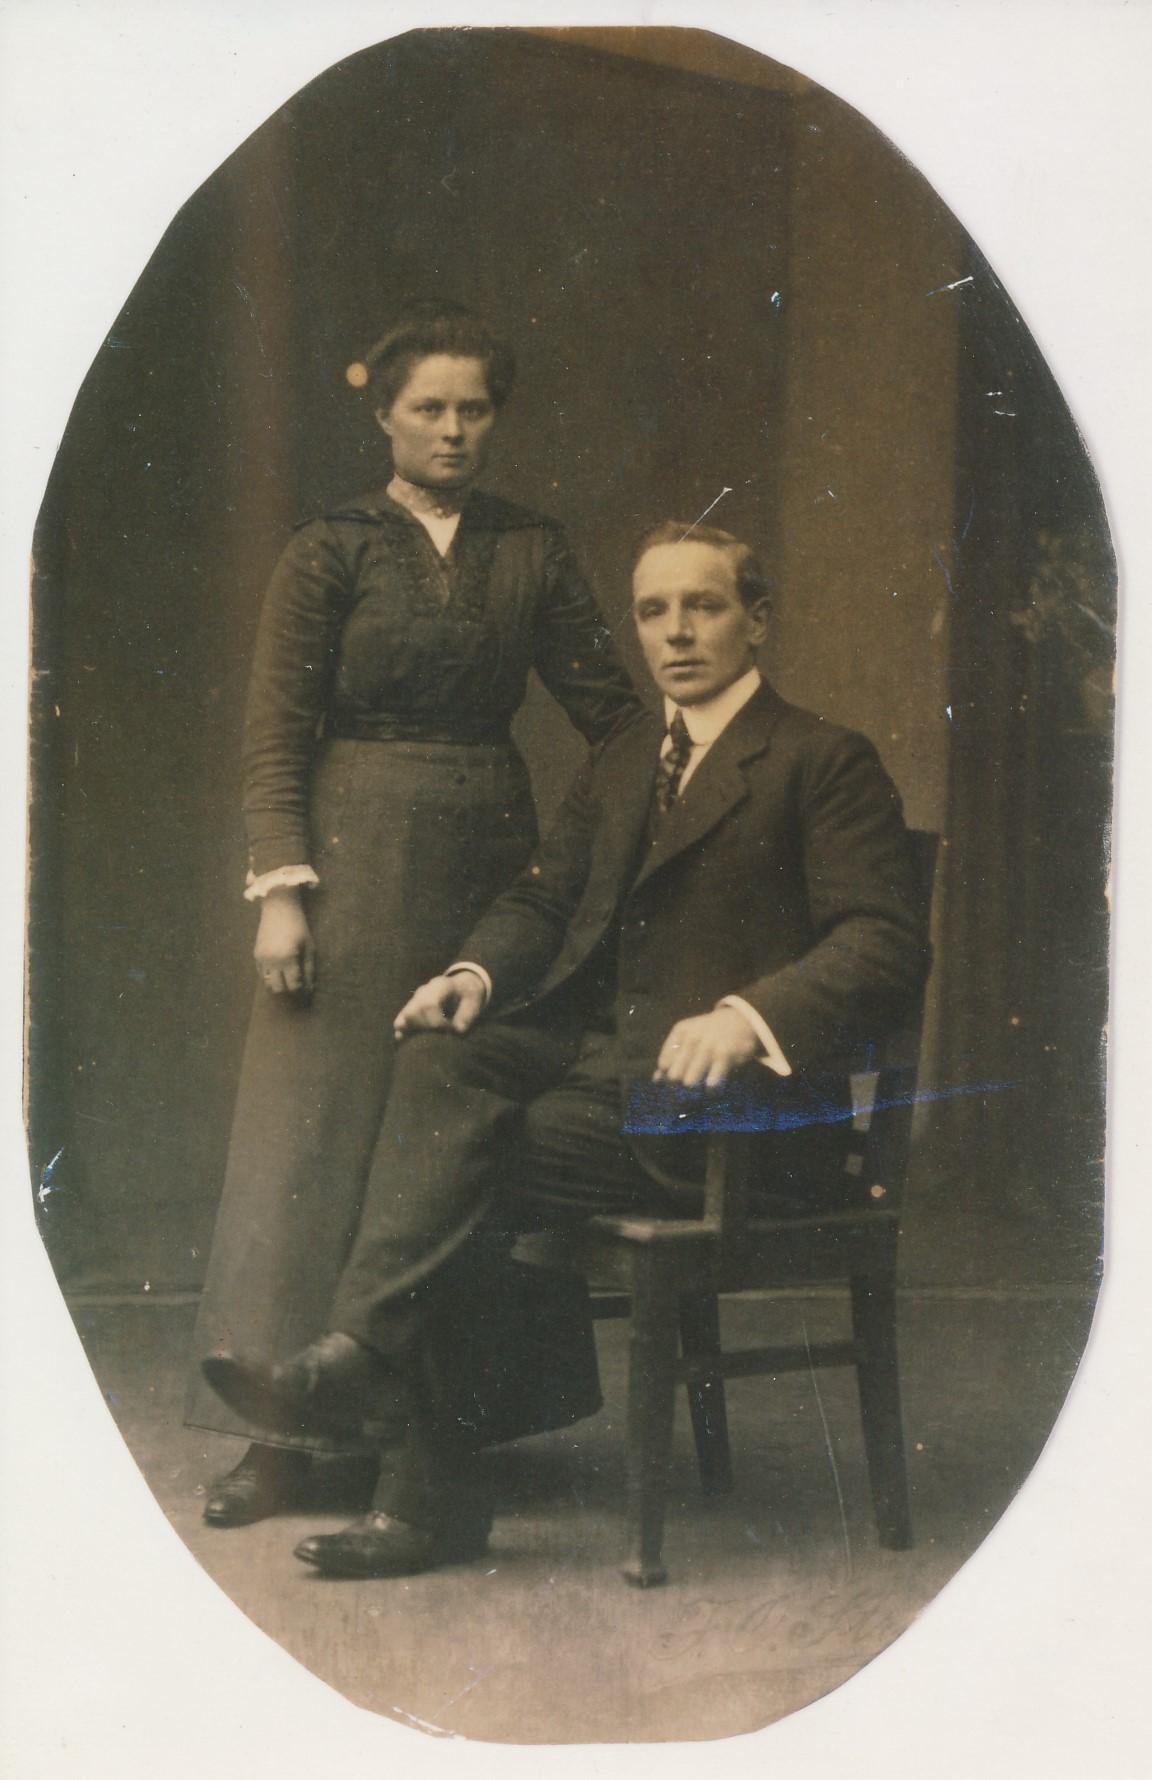 Fotoalbum Andre Kamsma, 120, Johannes Andries Kamsma, (24-06-1886 tot 16-01-1961) en Klaaske de Jong út Himmelum, 15-05-1916